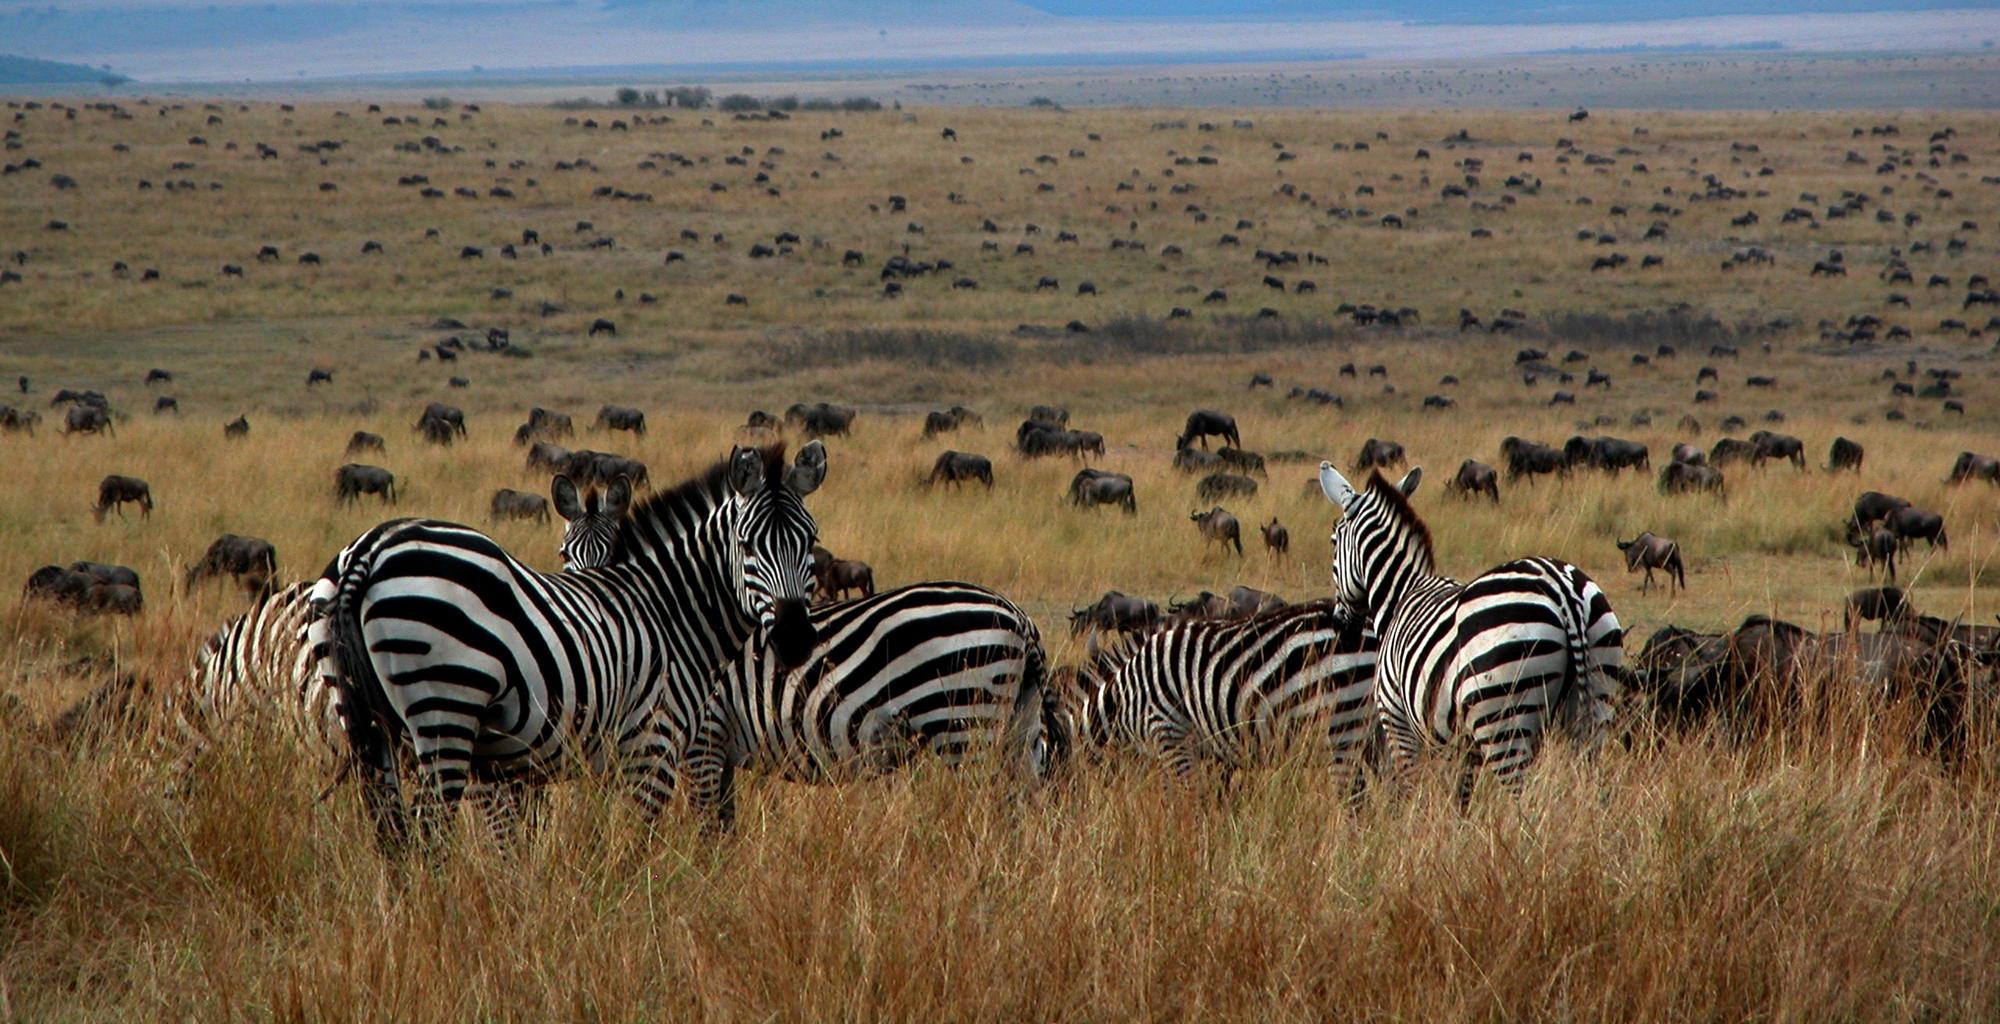 Kenya-Serian-Zebras